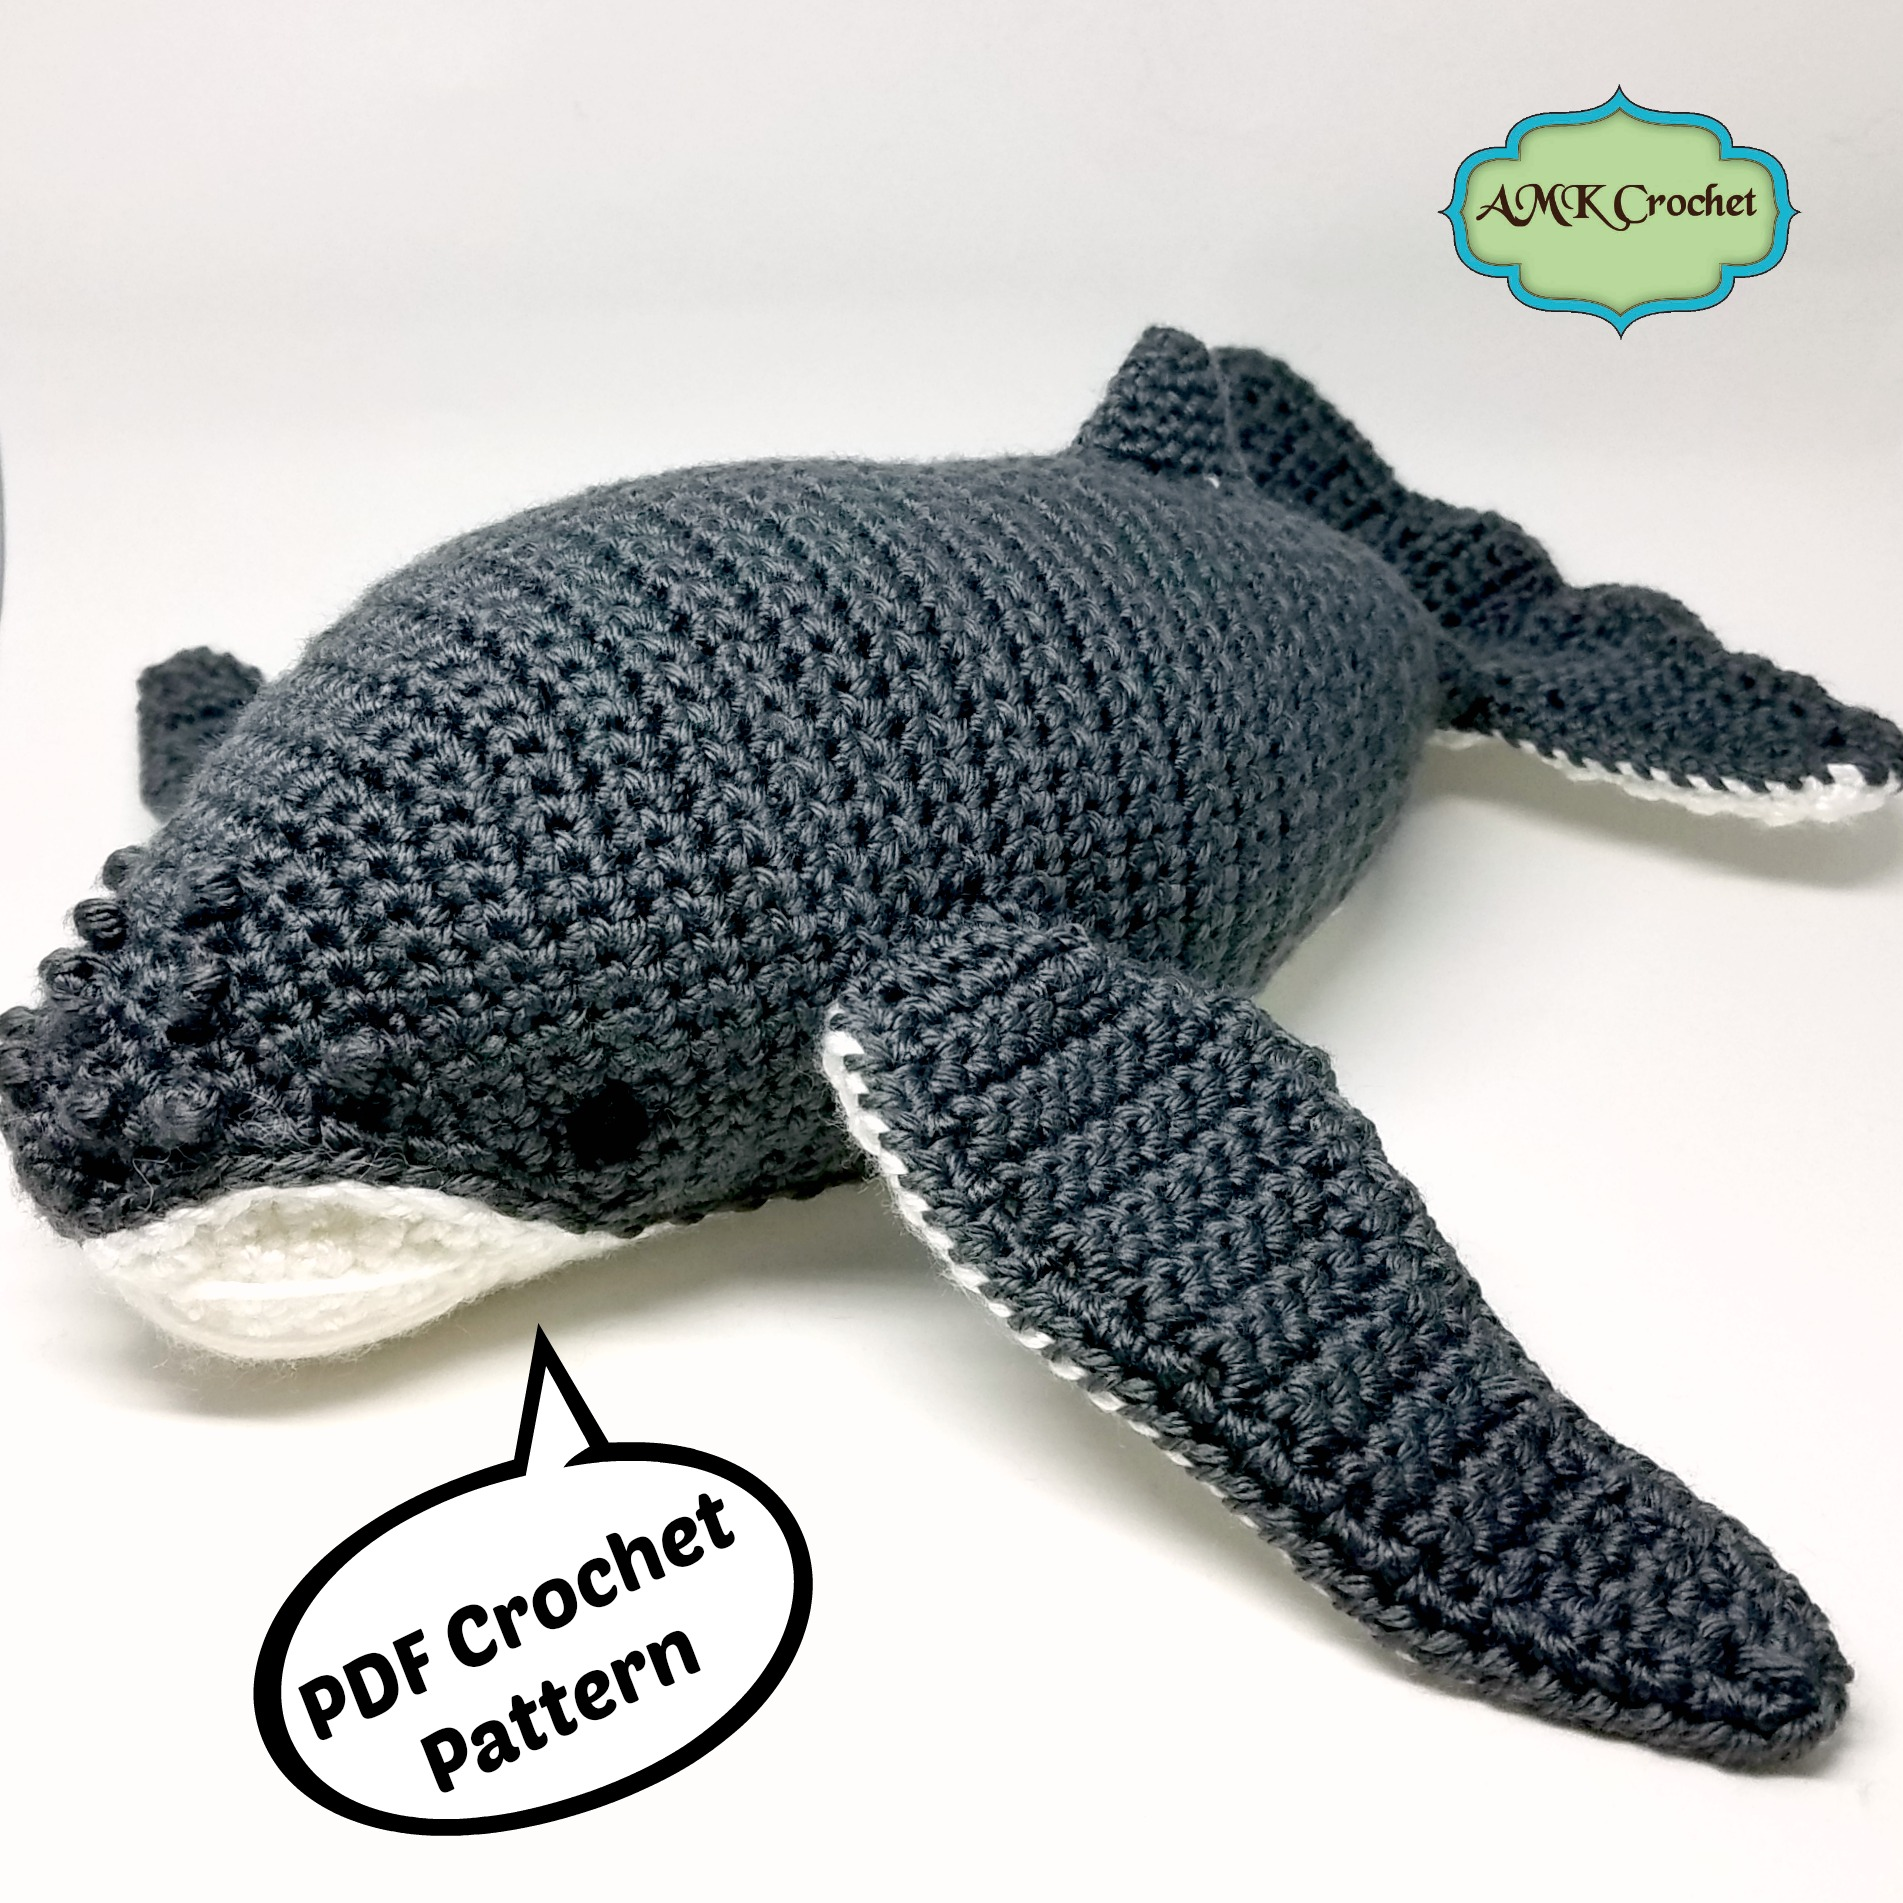 crochet humpback whale plush toy pattern amk crochet